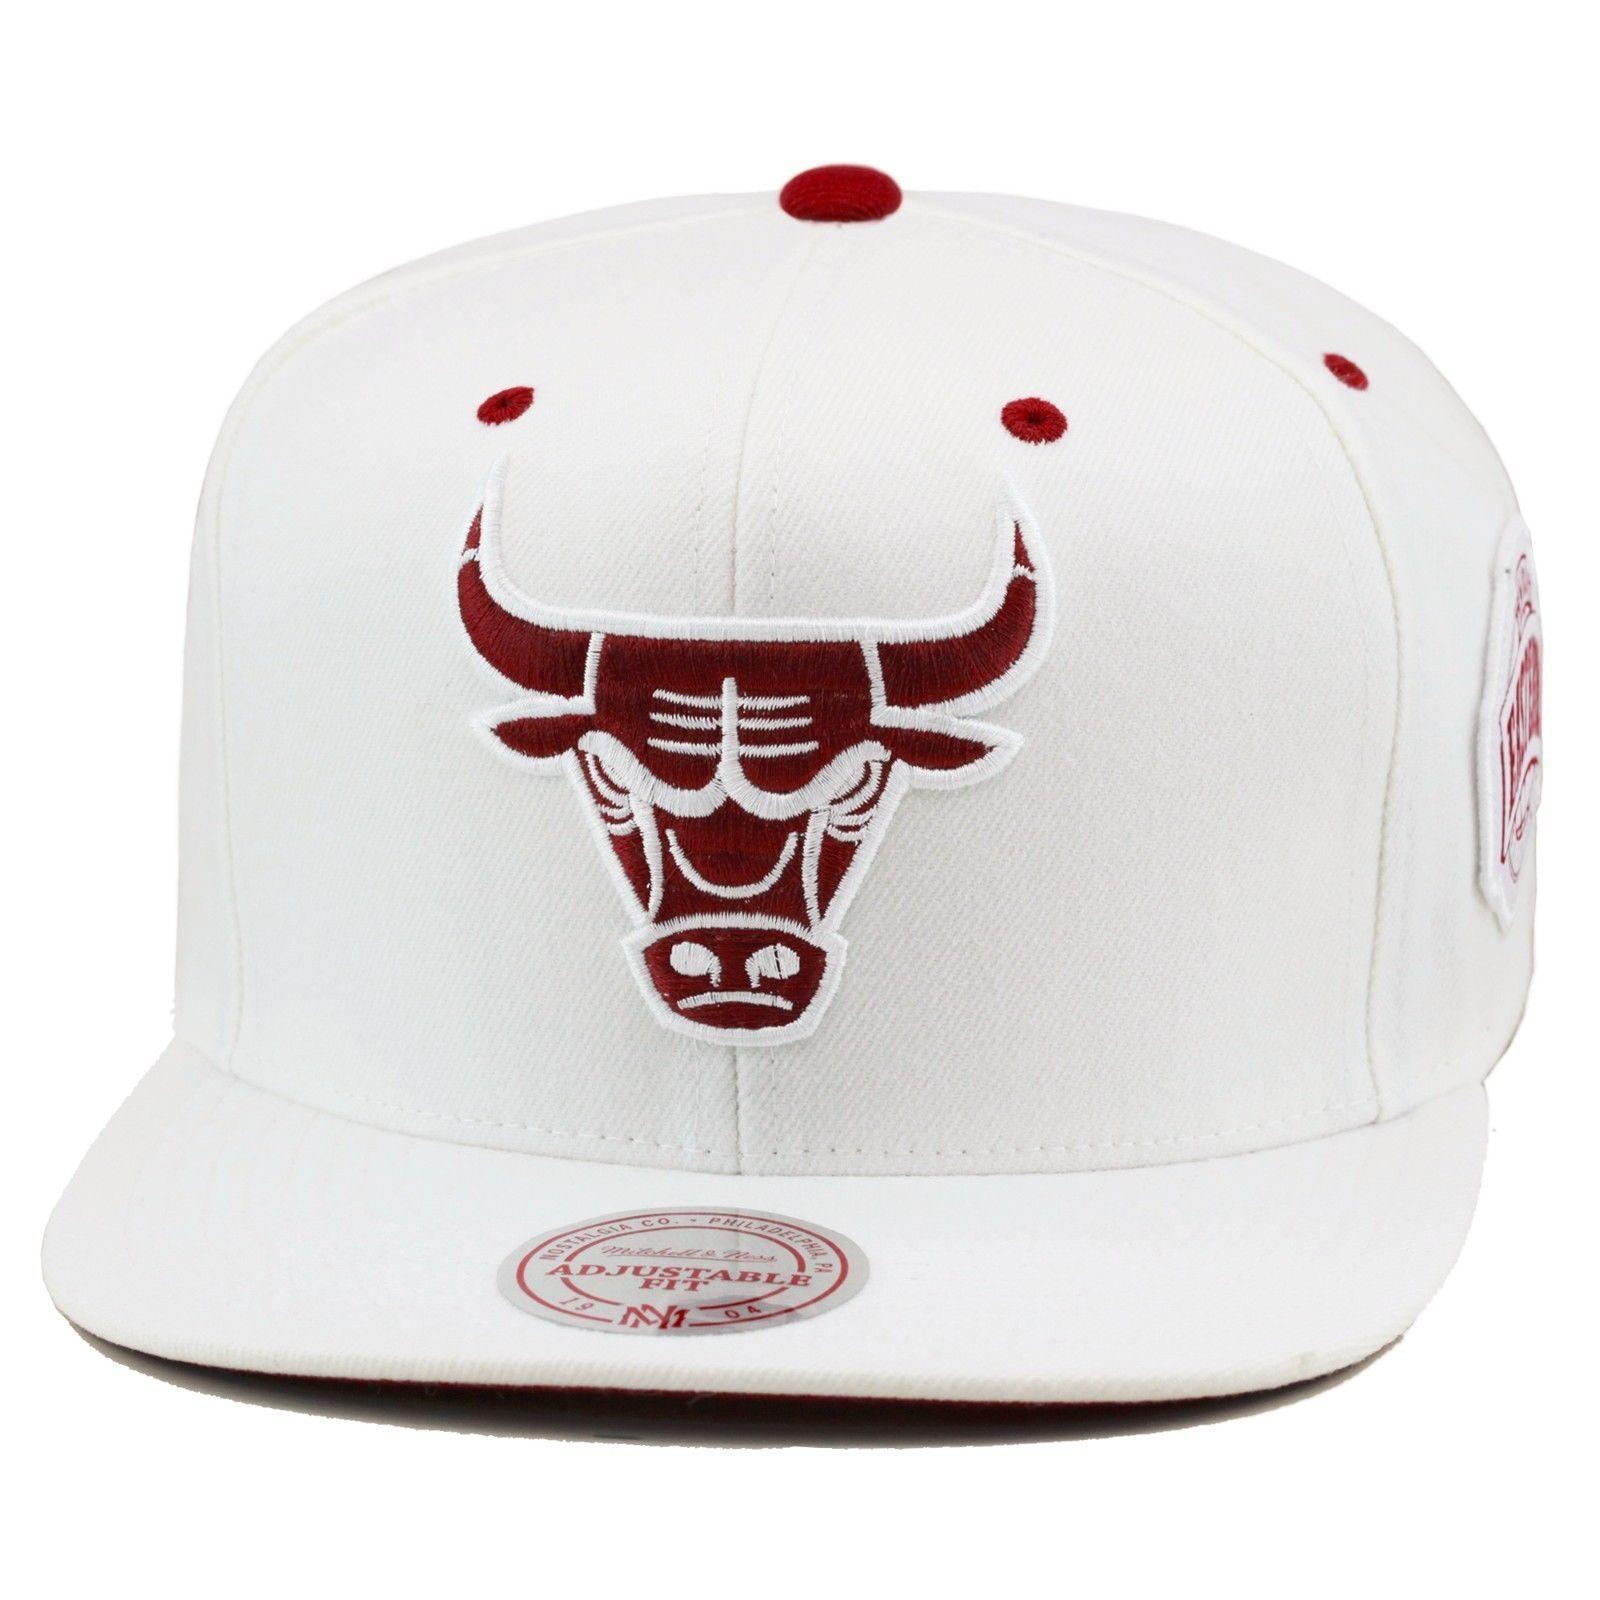 293e1dbd Mitchell & Ness Chicago Bulls Snapback Hat All White/Maroon For Jordan 6  Retro